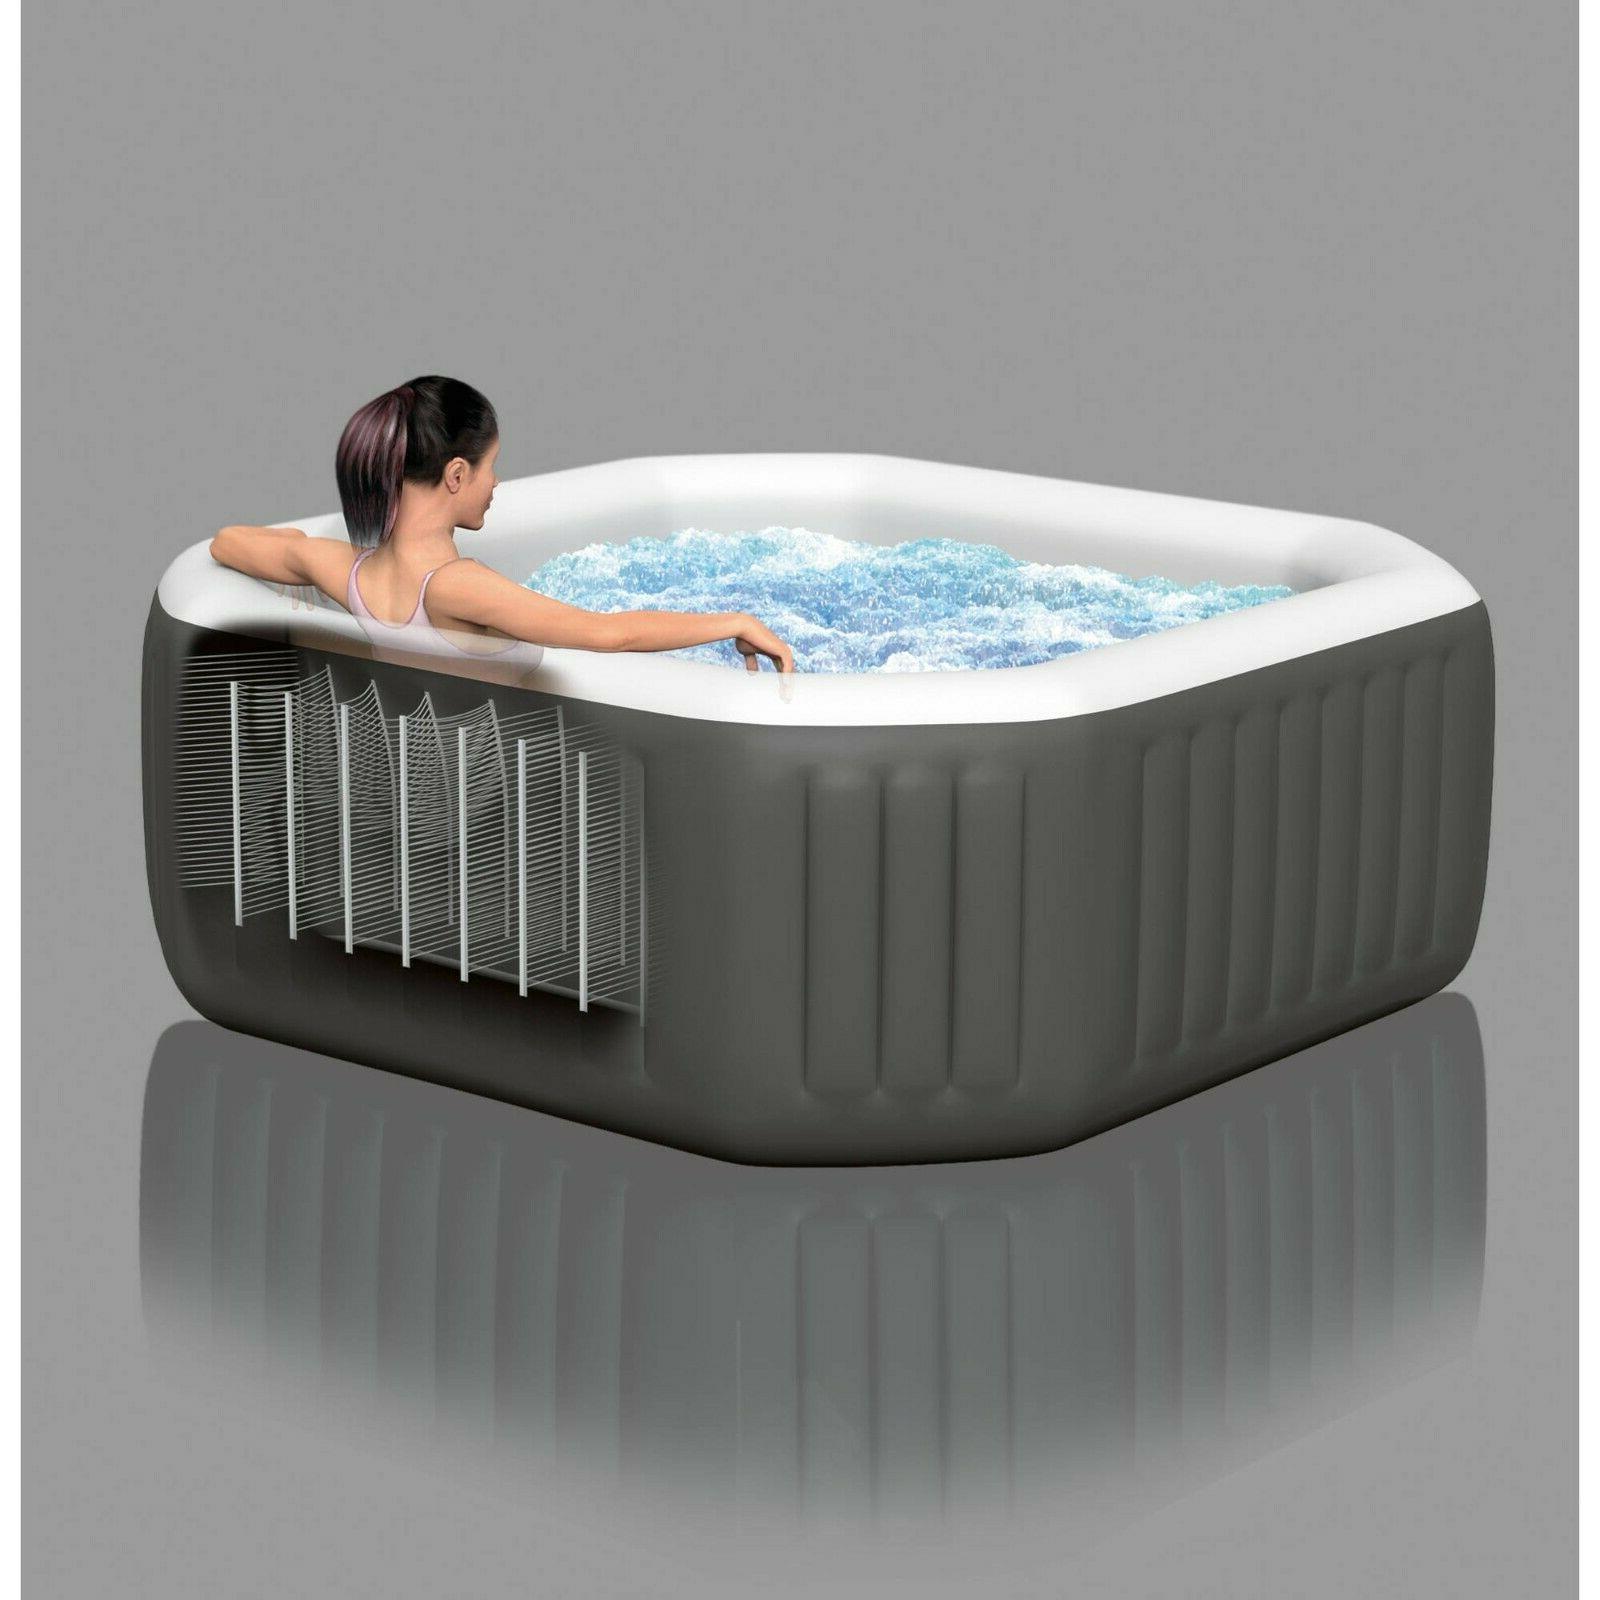 Intex 120 Bubble 4-Person Octagonal Inflatable Hot Tub - Same Day Ship